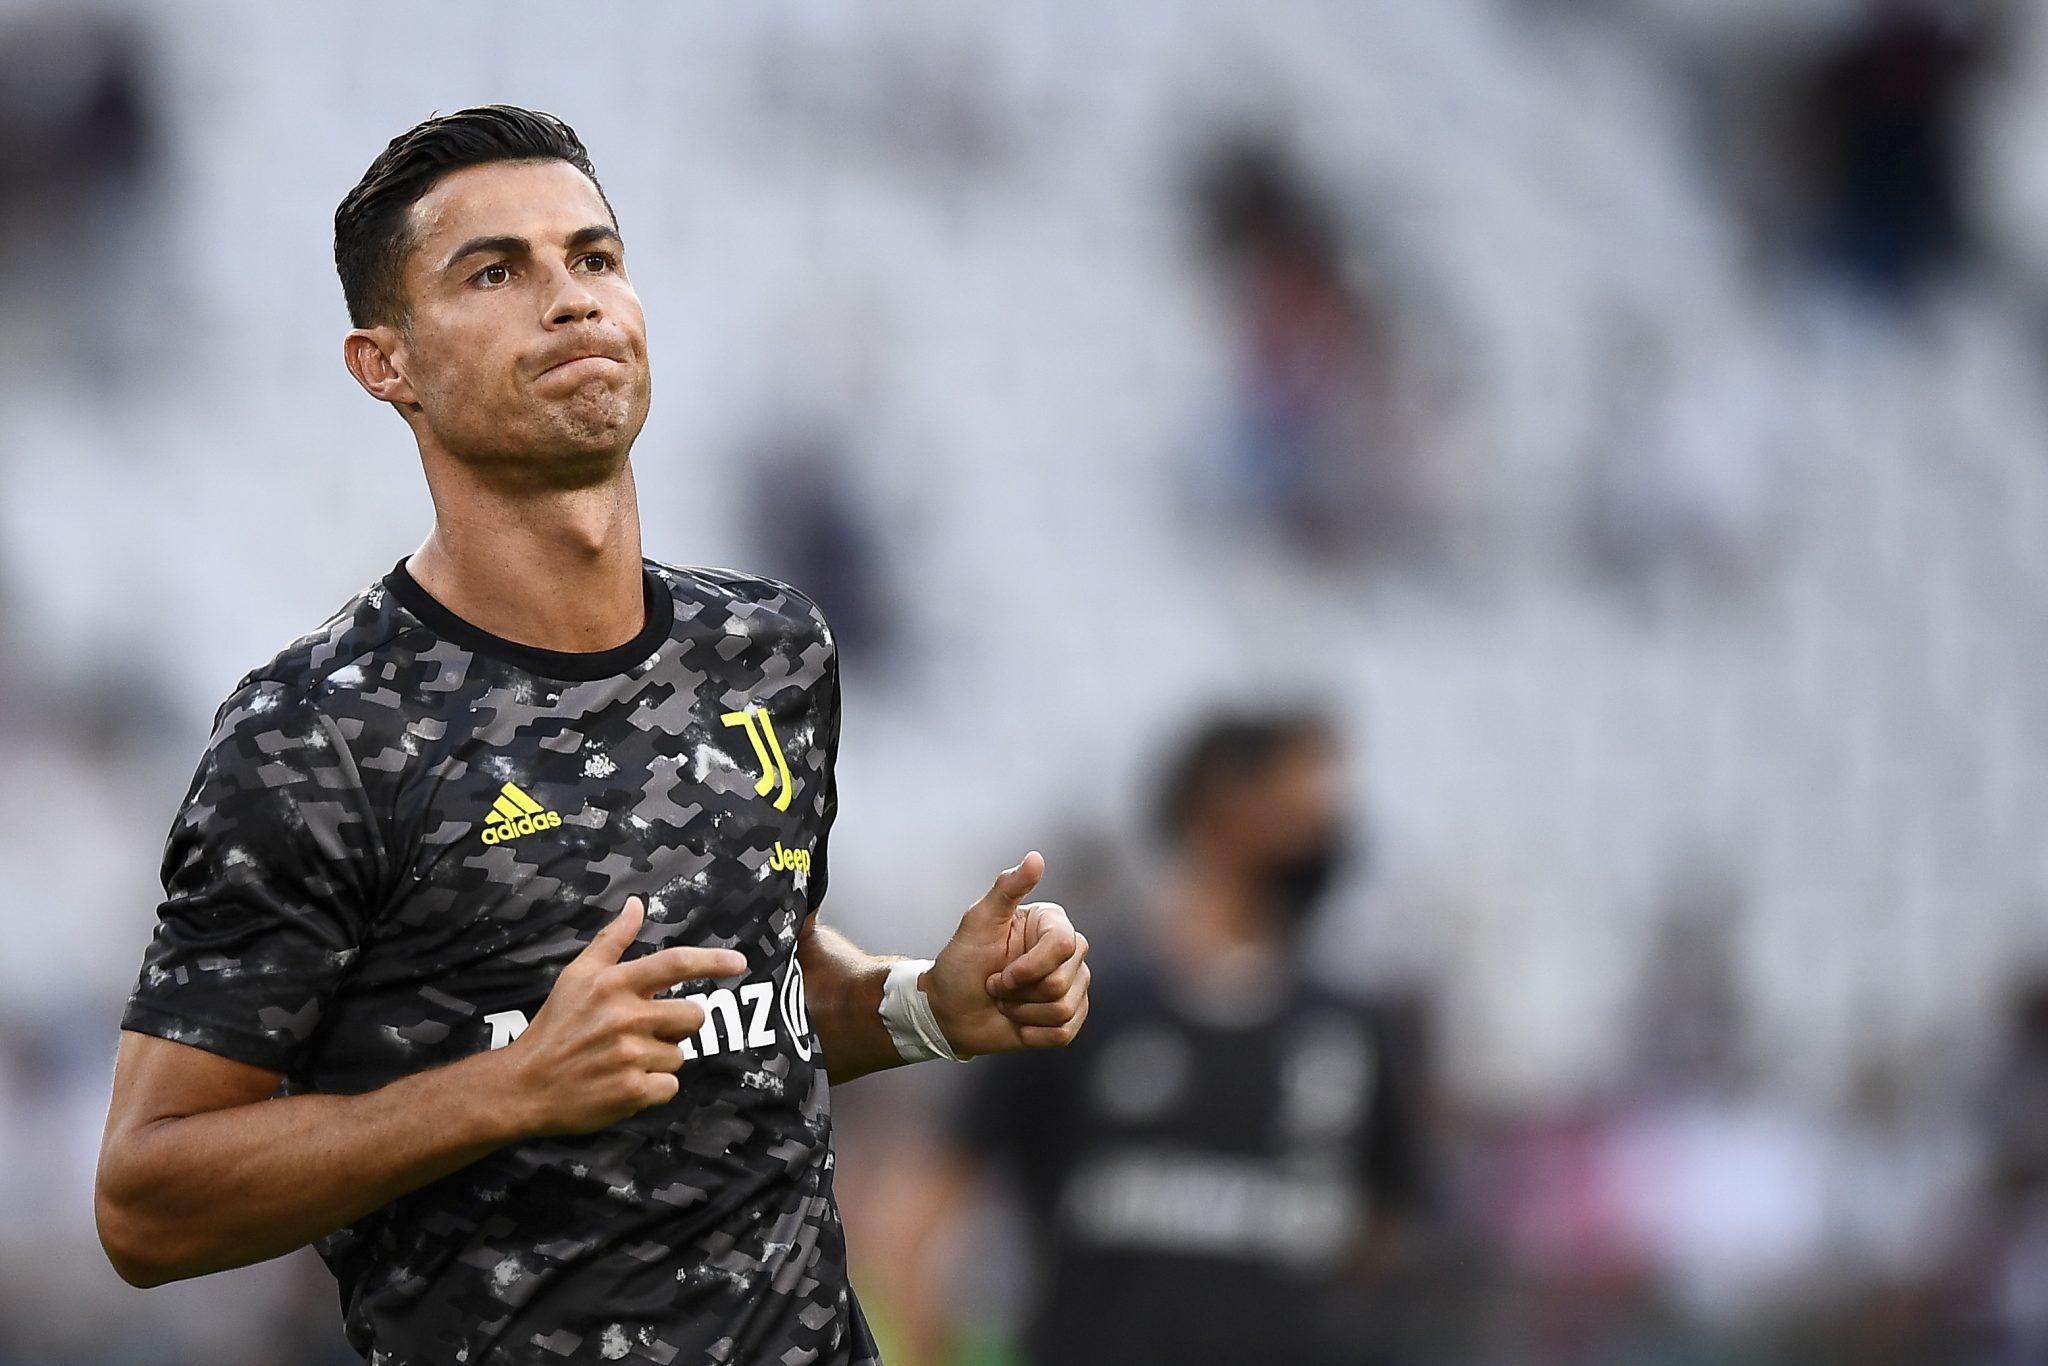 Cristiano Ronaldo City